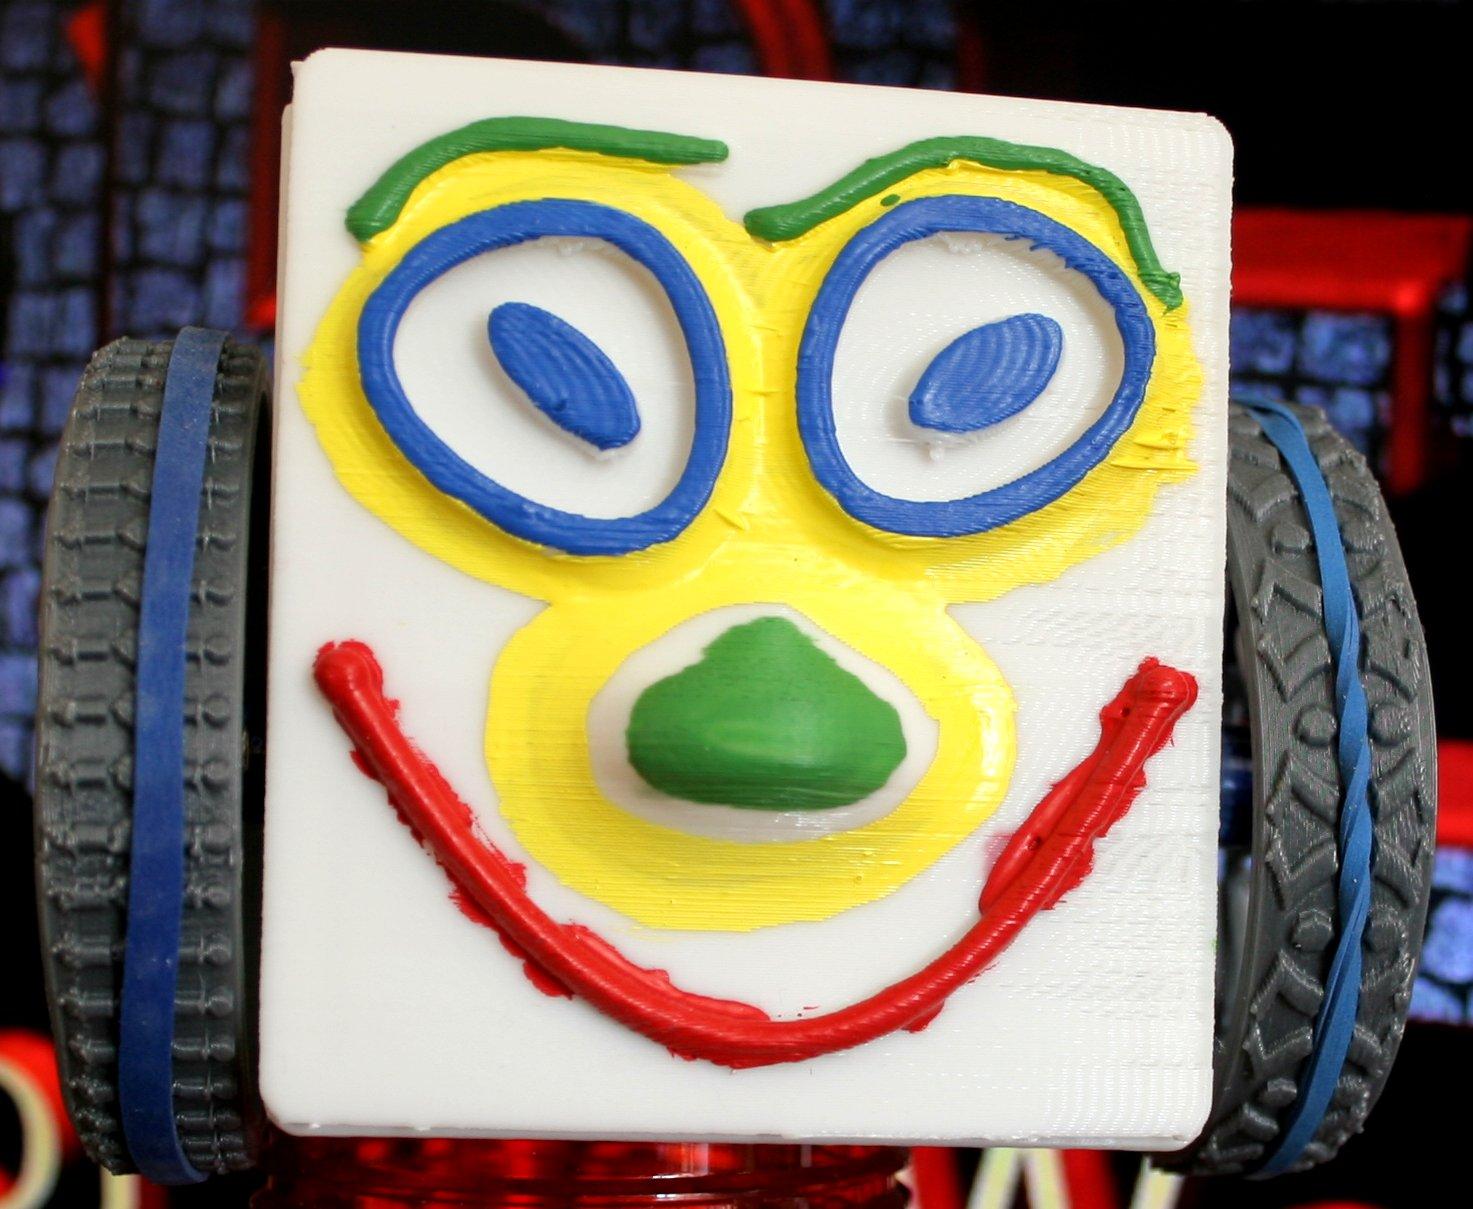 Picture of Talking, Singing and Dancing MiniFloppyBot Robot